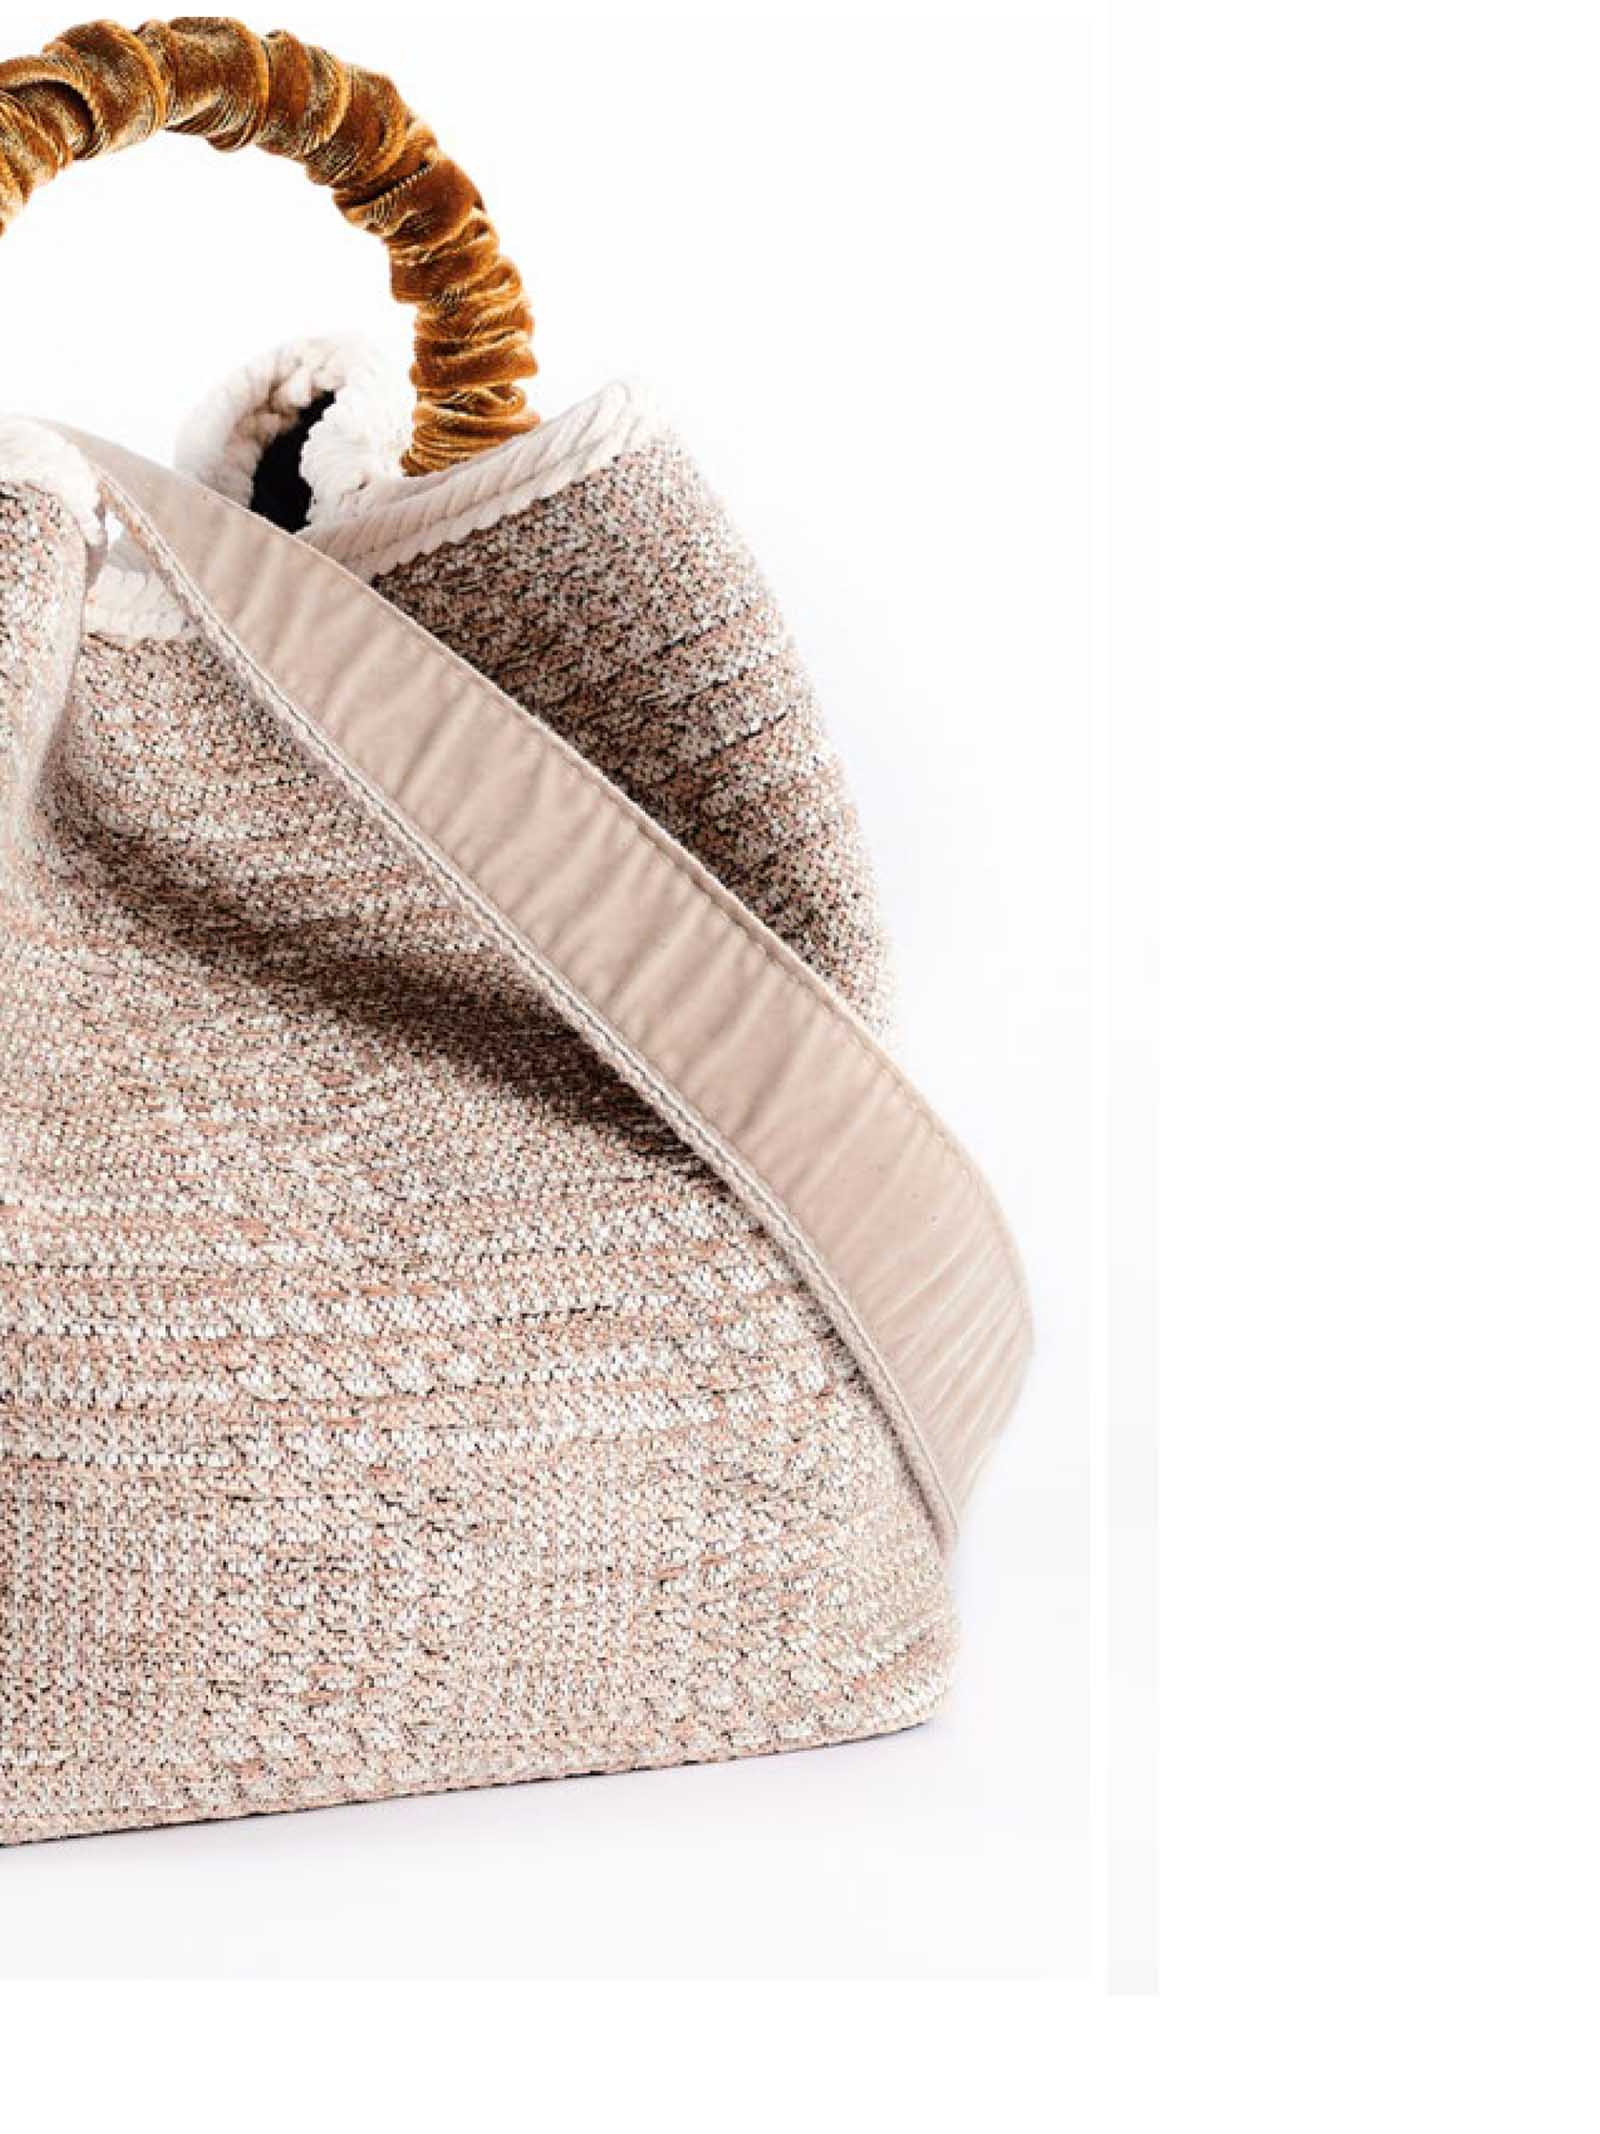 Women's Bucket Bag Zermat Madras in Beige Jacquard Chenille with Velvet Handle and Fancy Shoulder Strap Via Mail Bag | Bags and backpacks | ZERMATM02